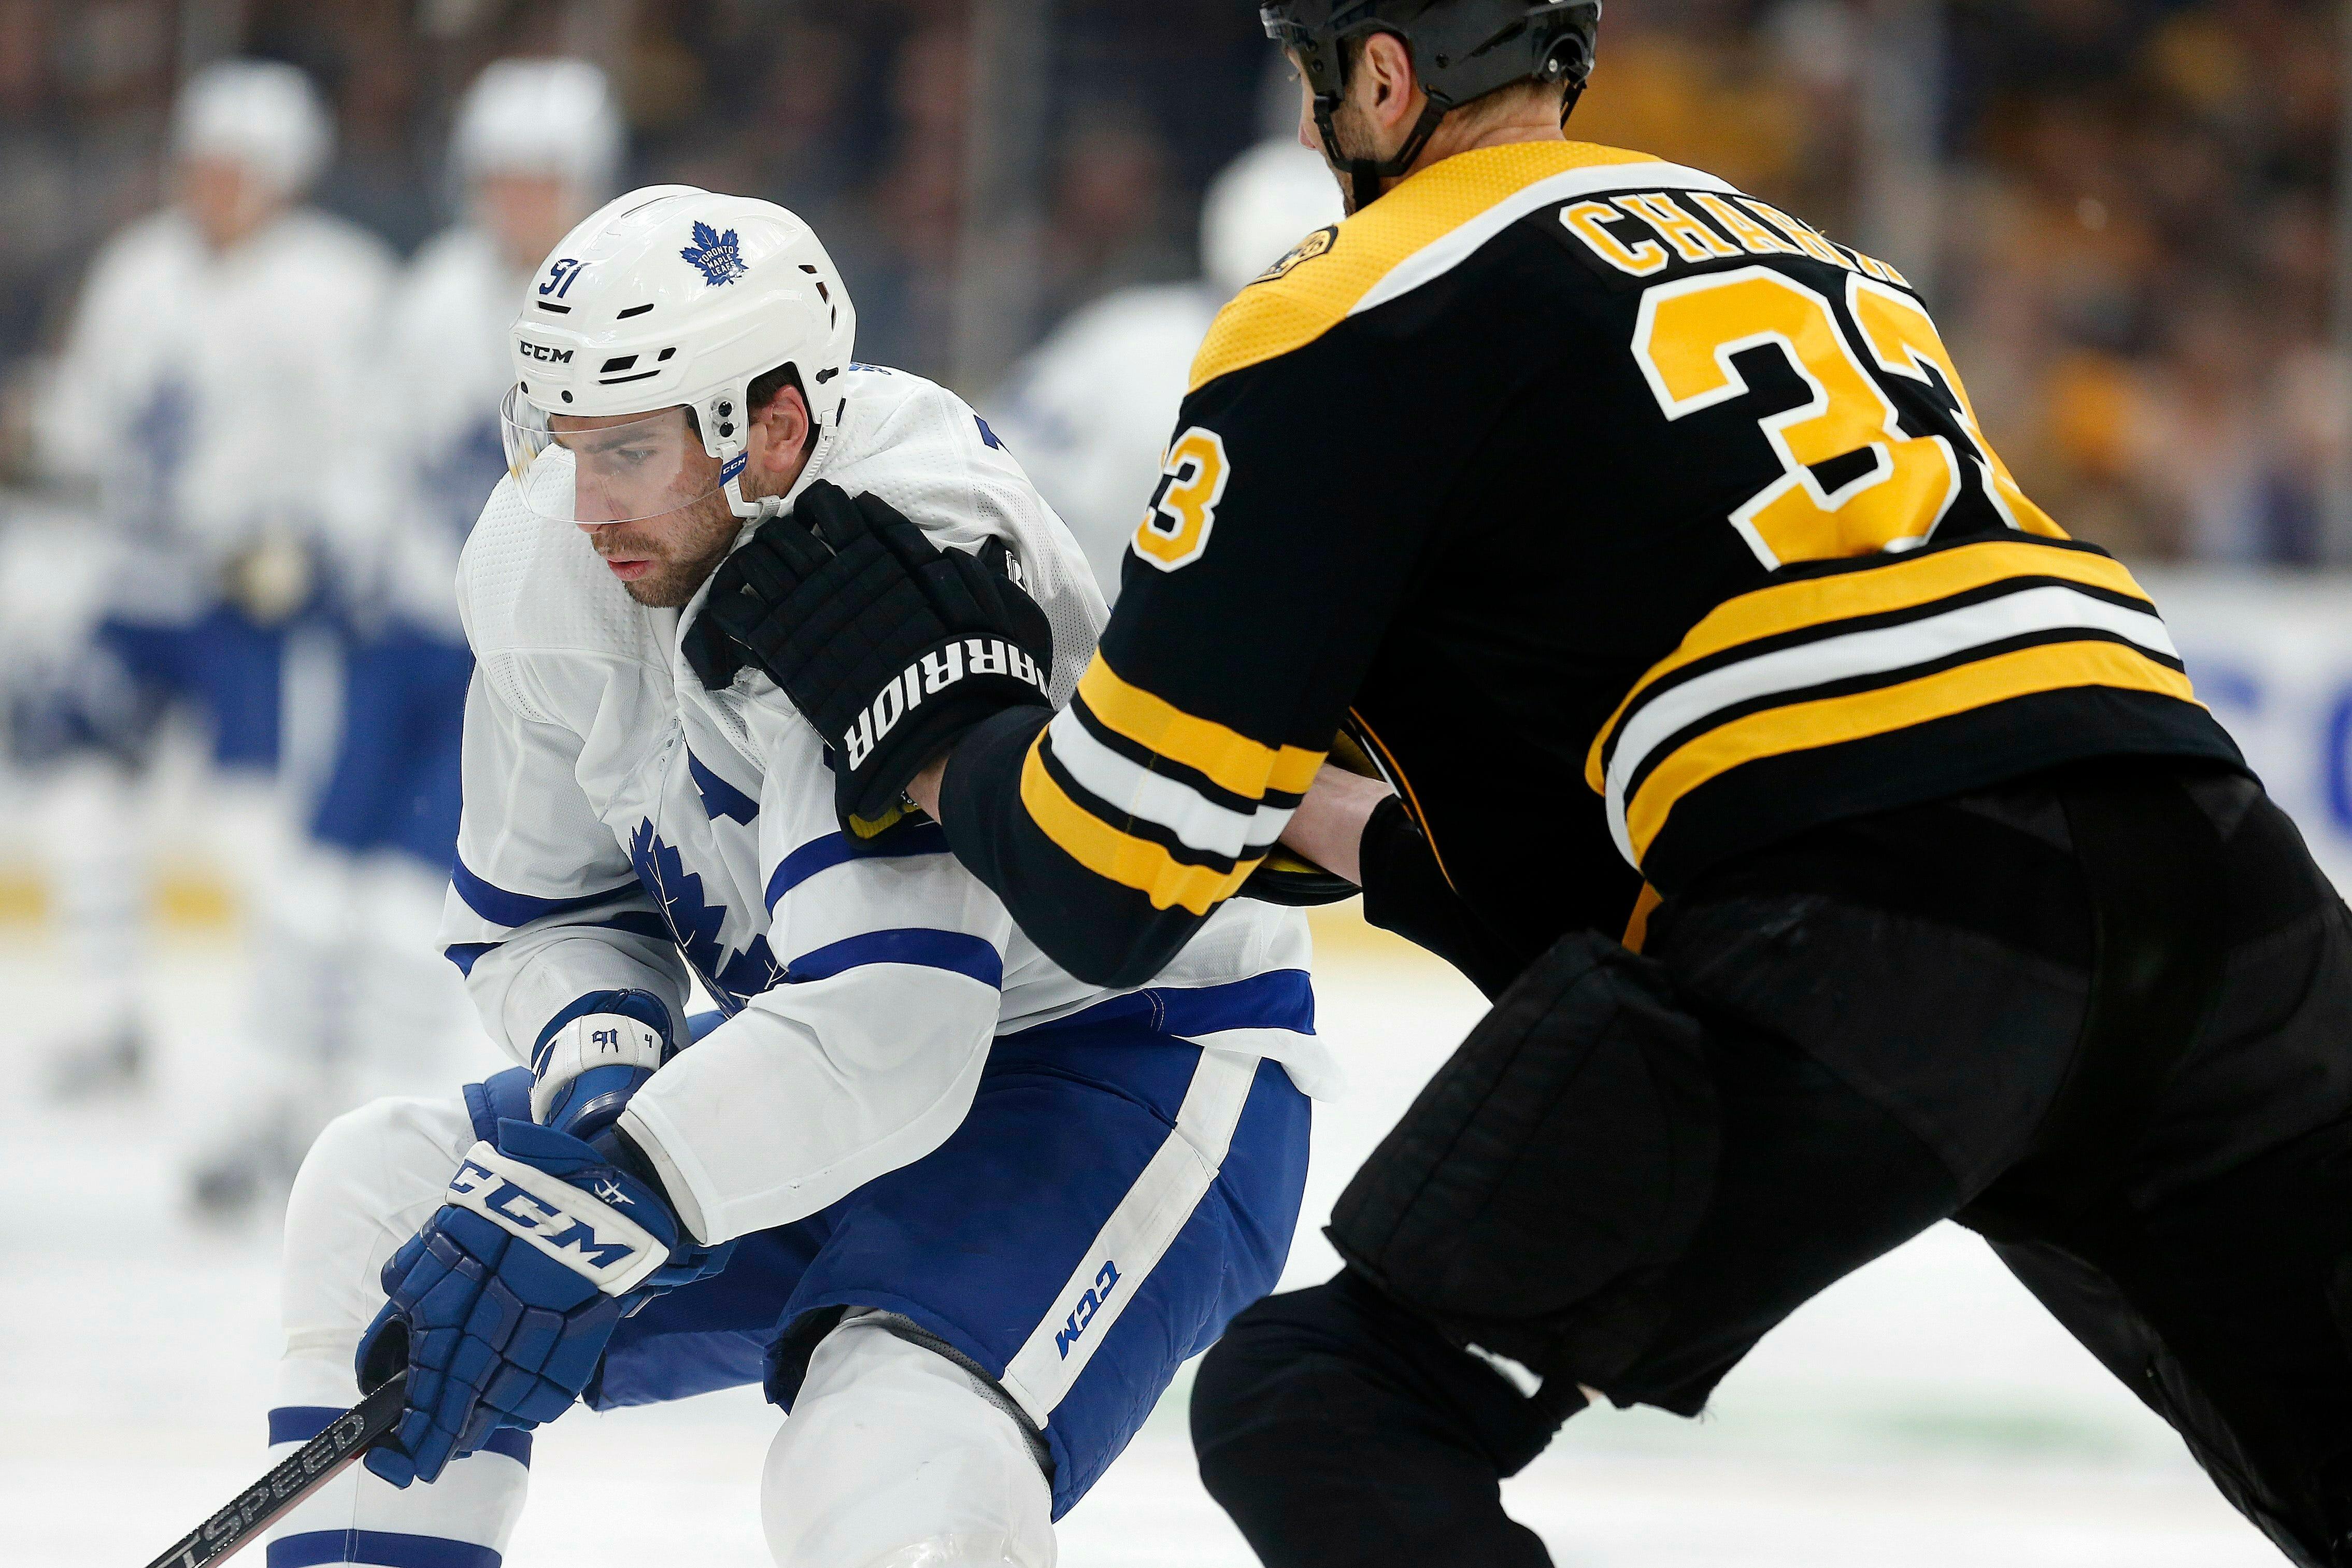 Matthews, Kapanen score late, Maple Leafs edge Bruins 2-1